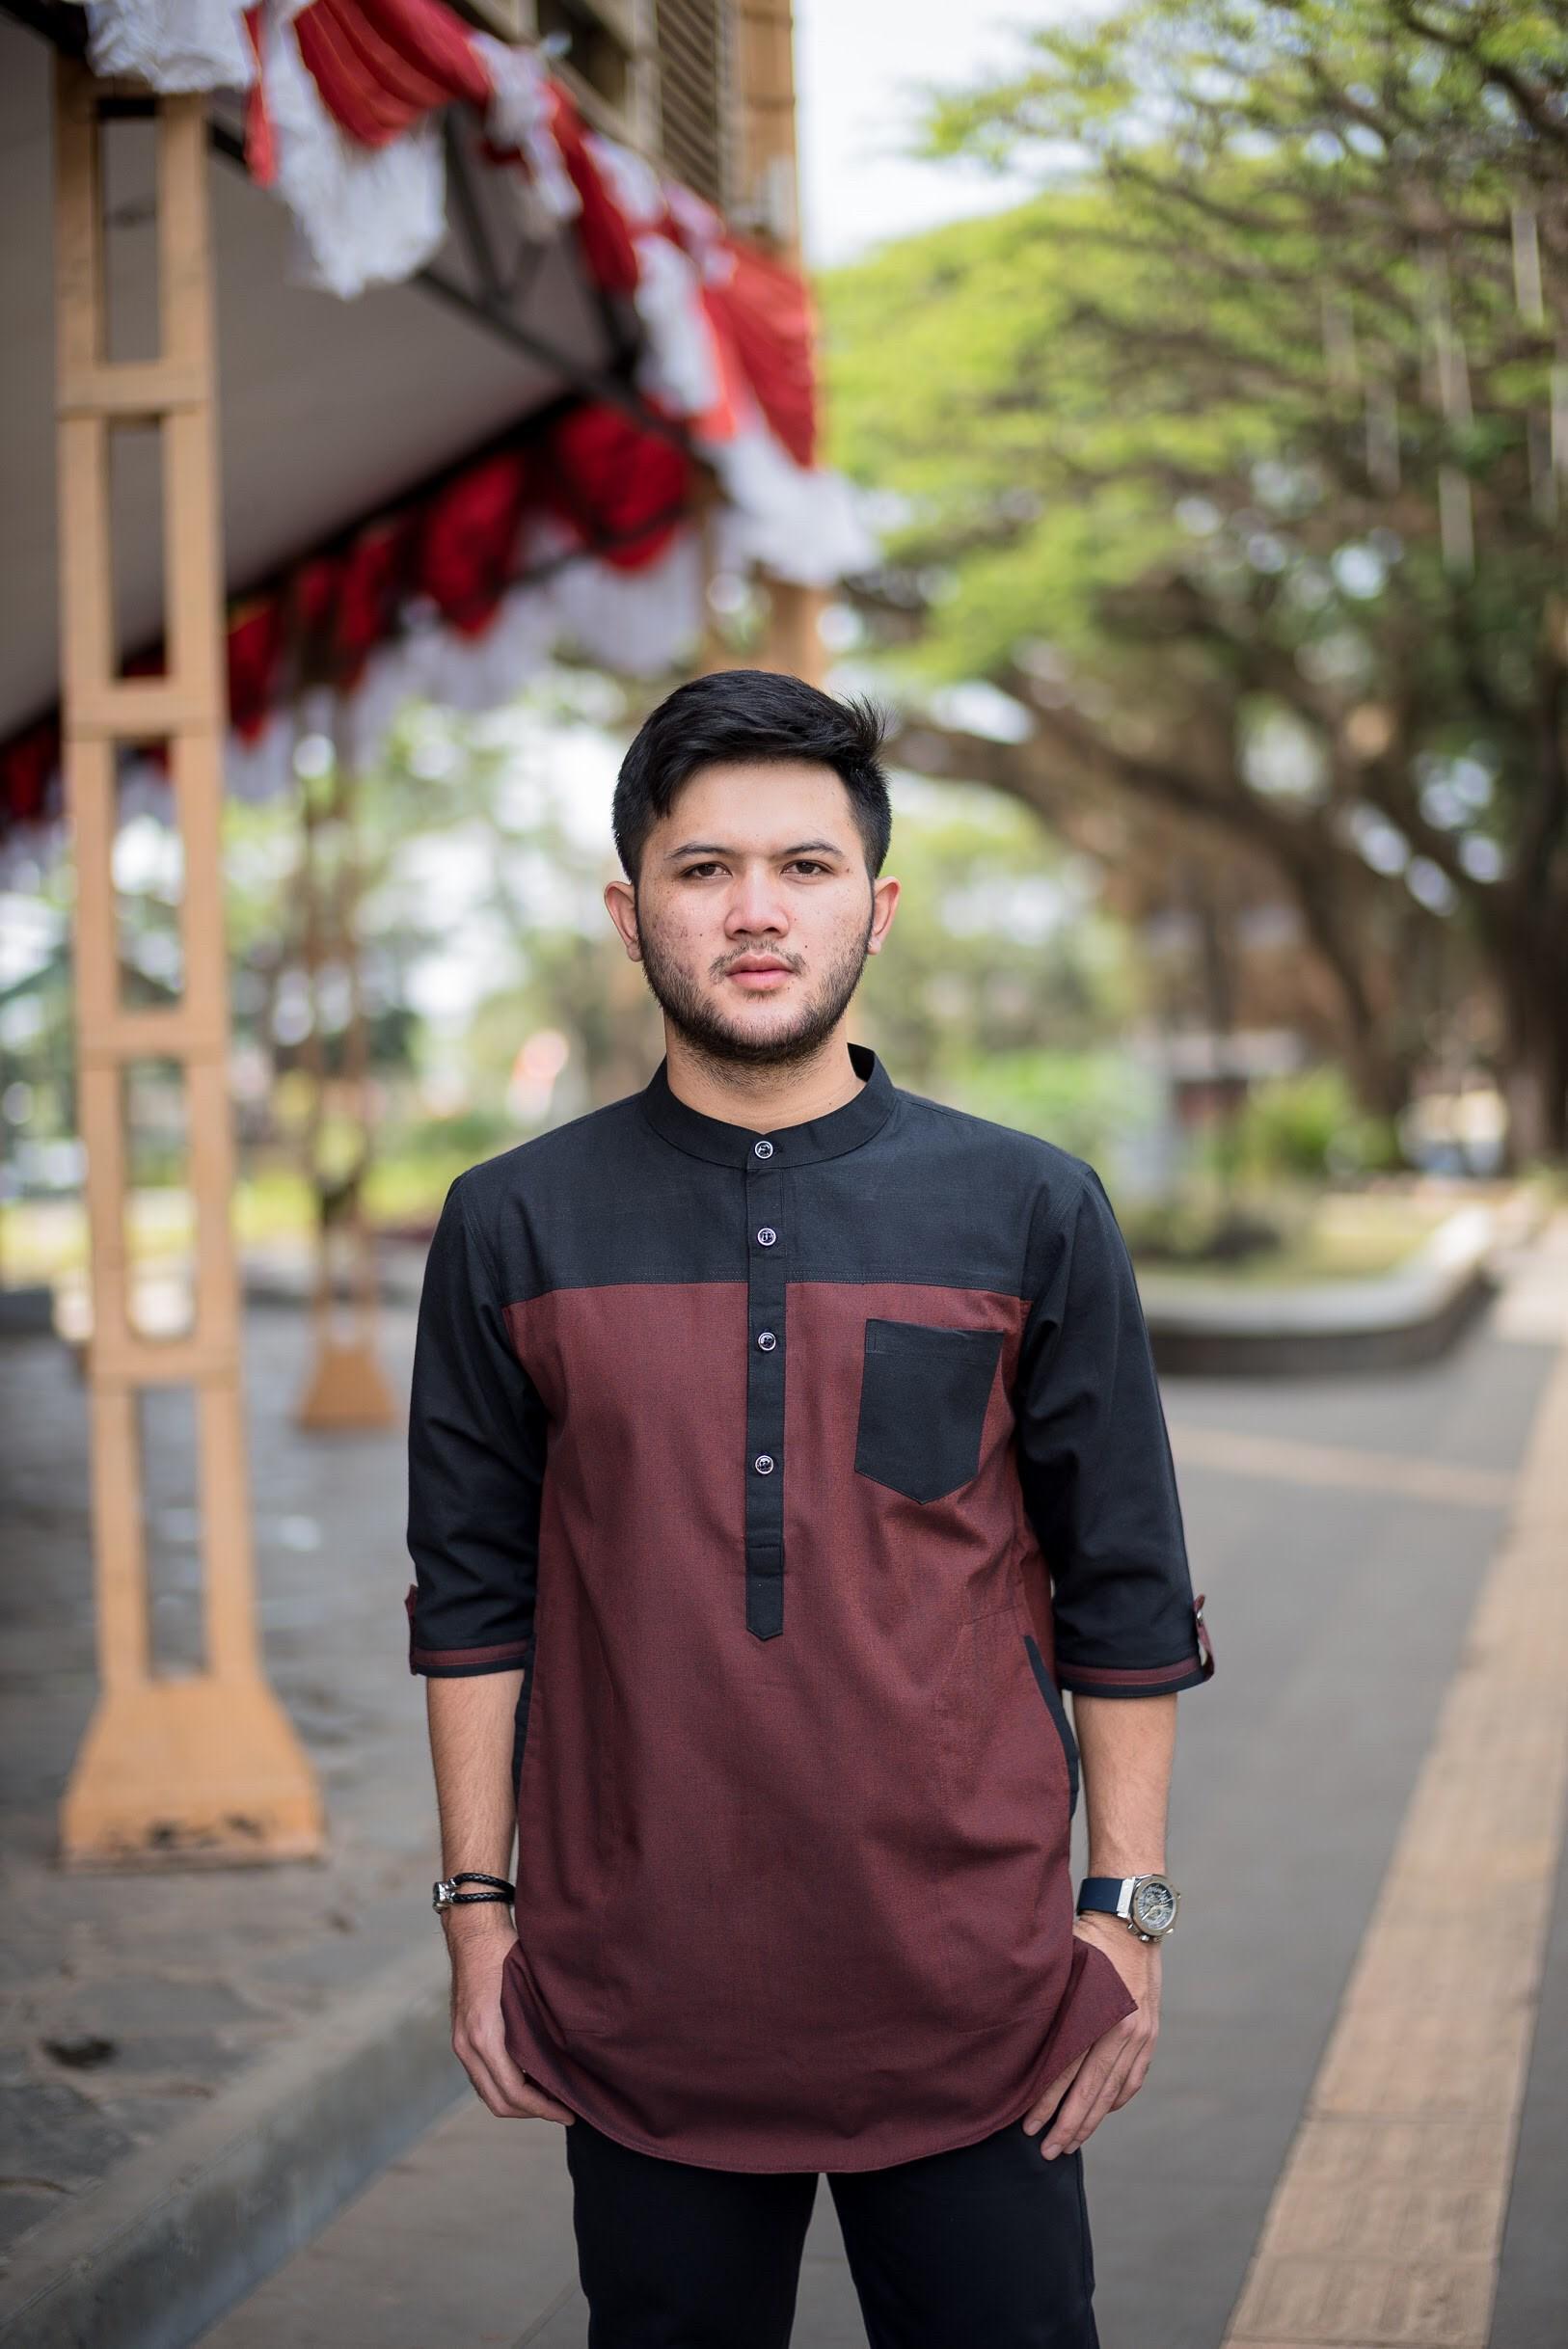 COD AJA - ORIGINAL PRODUK FOUR KDL Baju Muslim Koko Pakistan Qurta Pria  Terbaru 8 Model Semi 8/8 / Baju Shalat Laki - Laki / Gamis Shalat Pria /